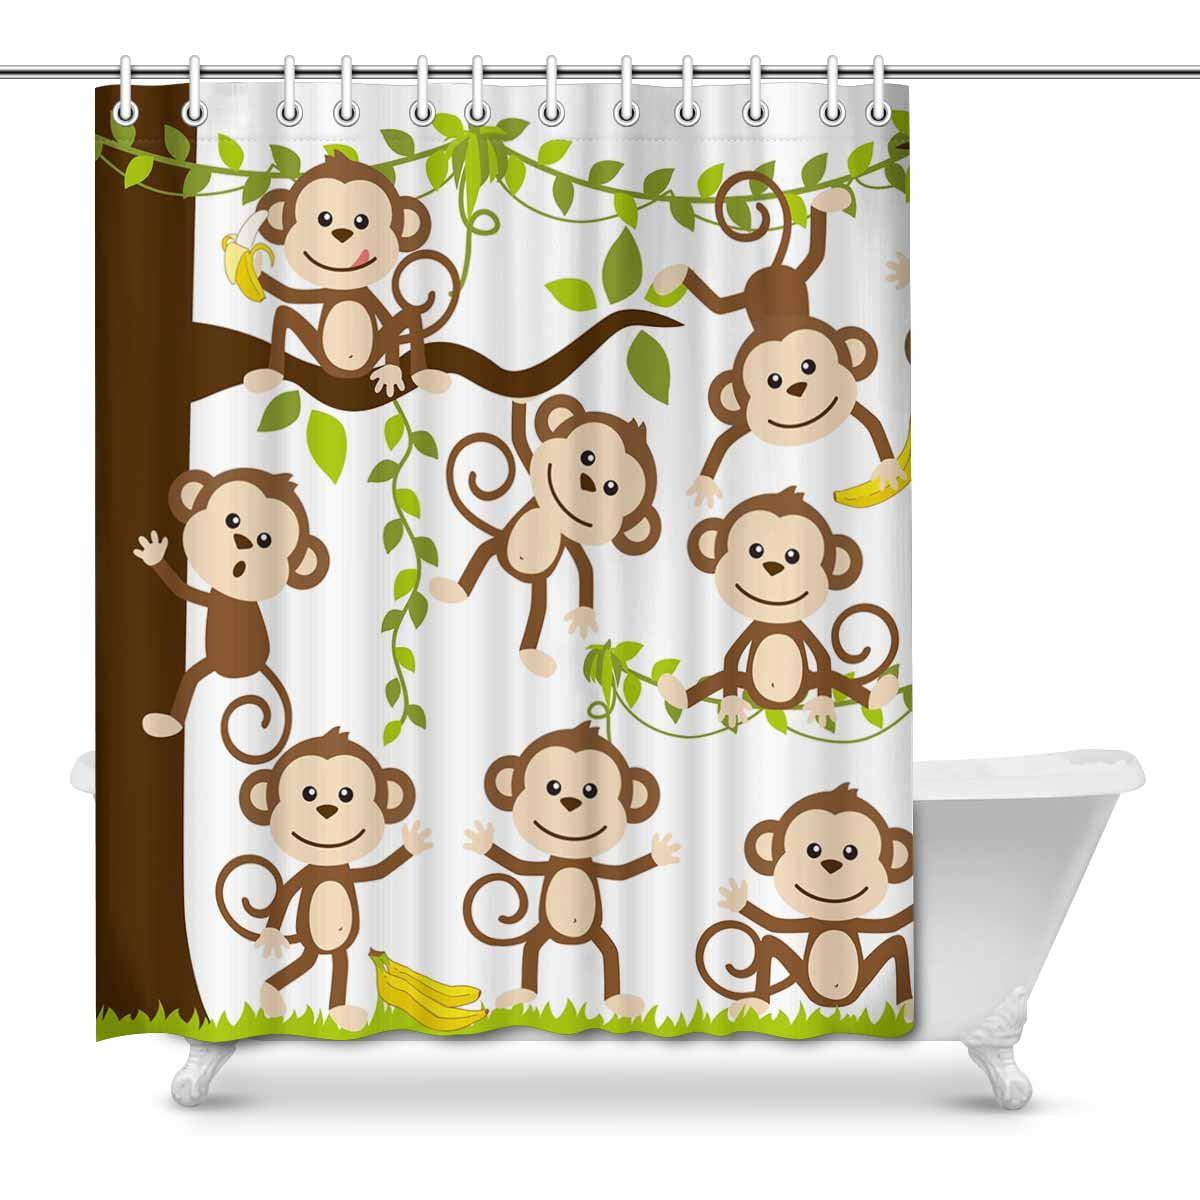 MKHERT Cute Cartoon Monkey Art Decor Waterproof Polyester